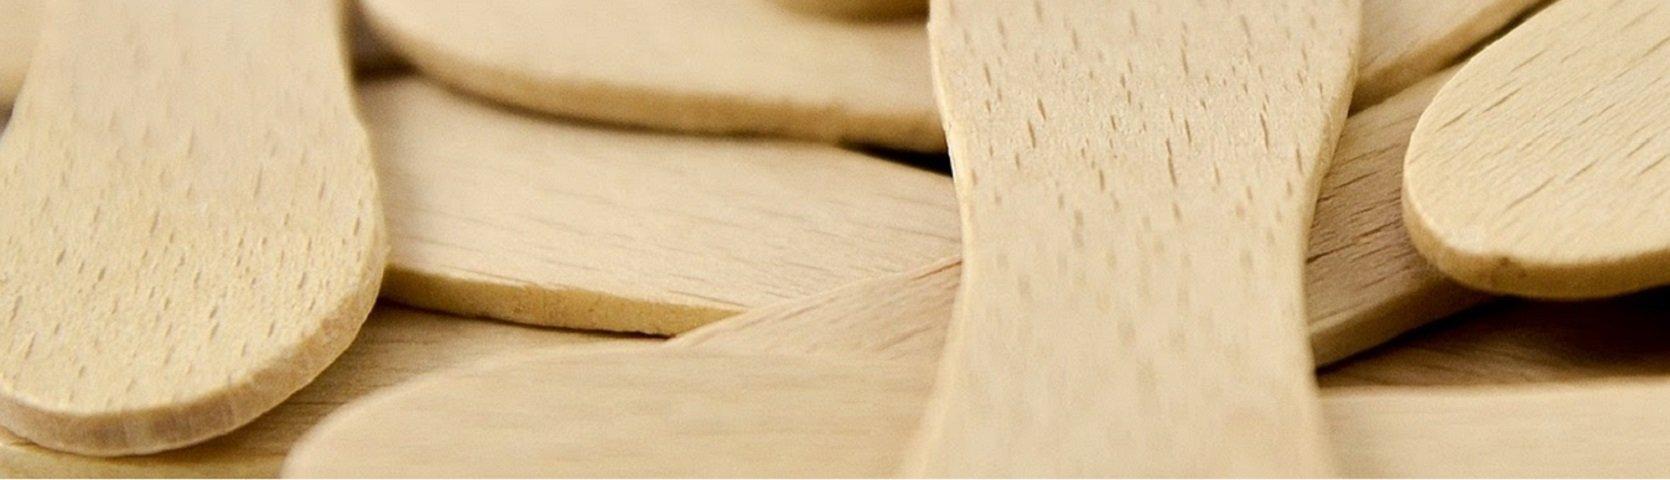 smart wood Germany GmbH & Co. KG